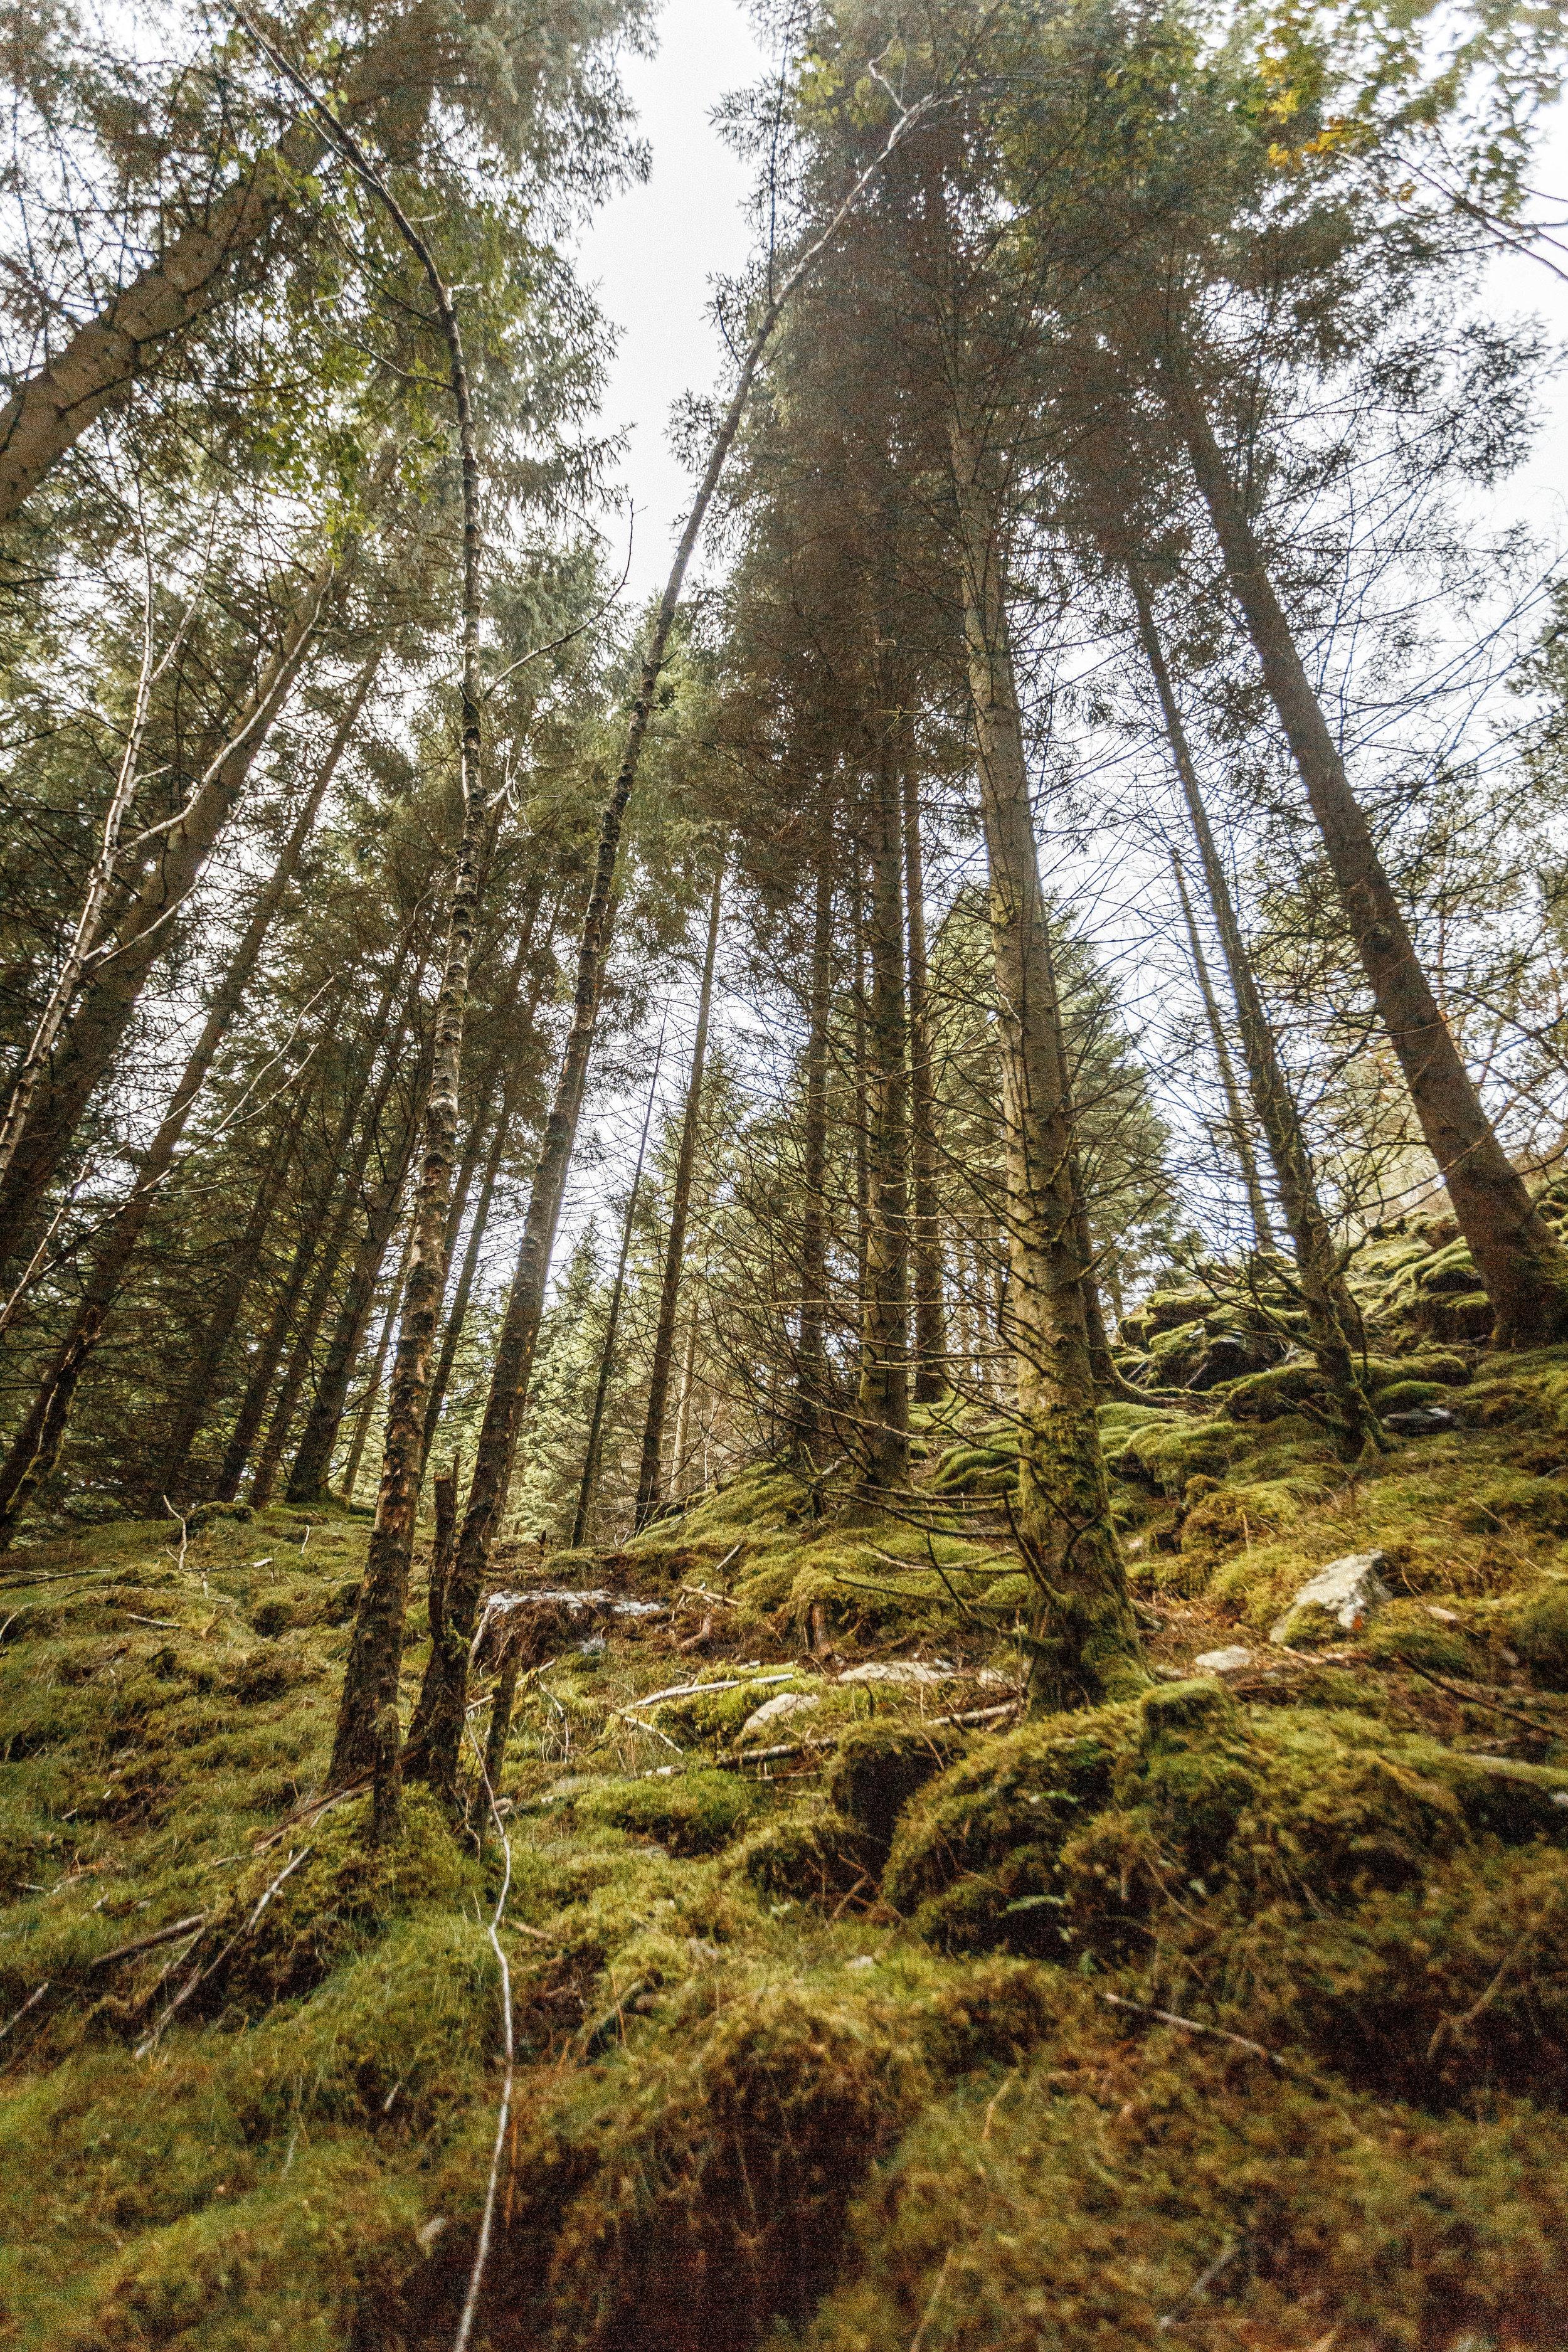 North_forest_13.jpg